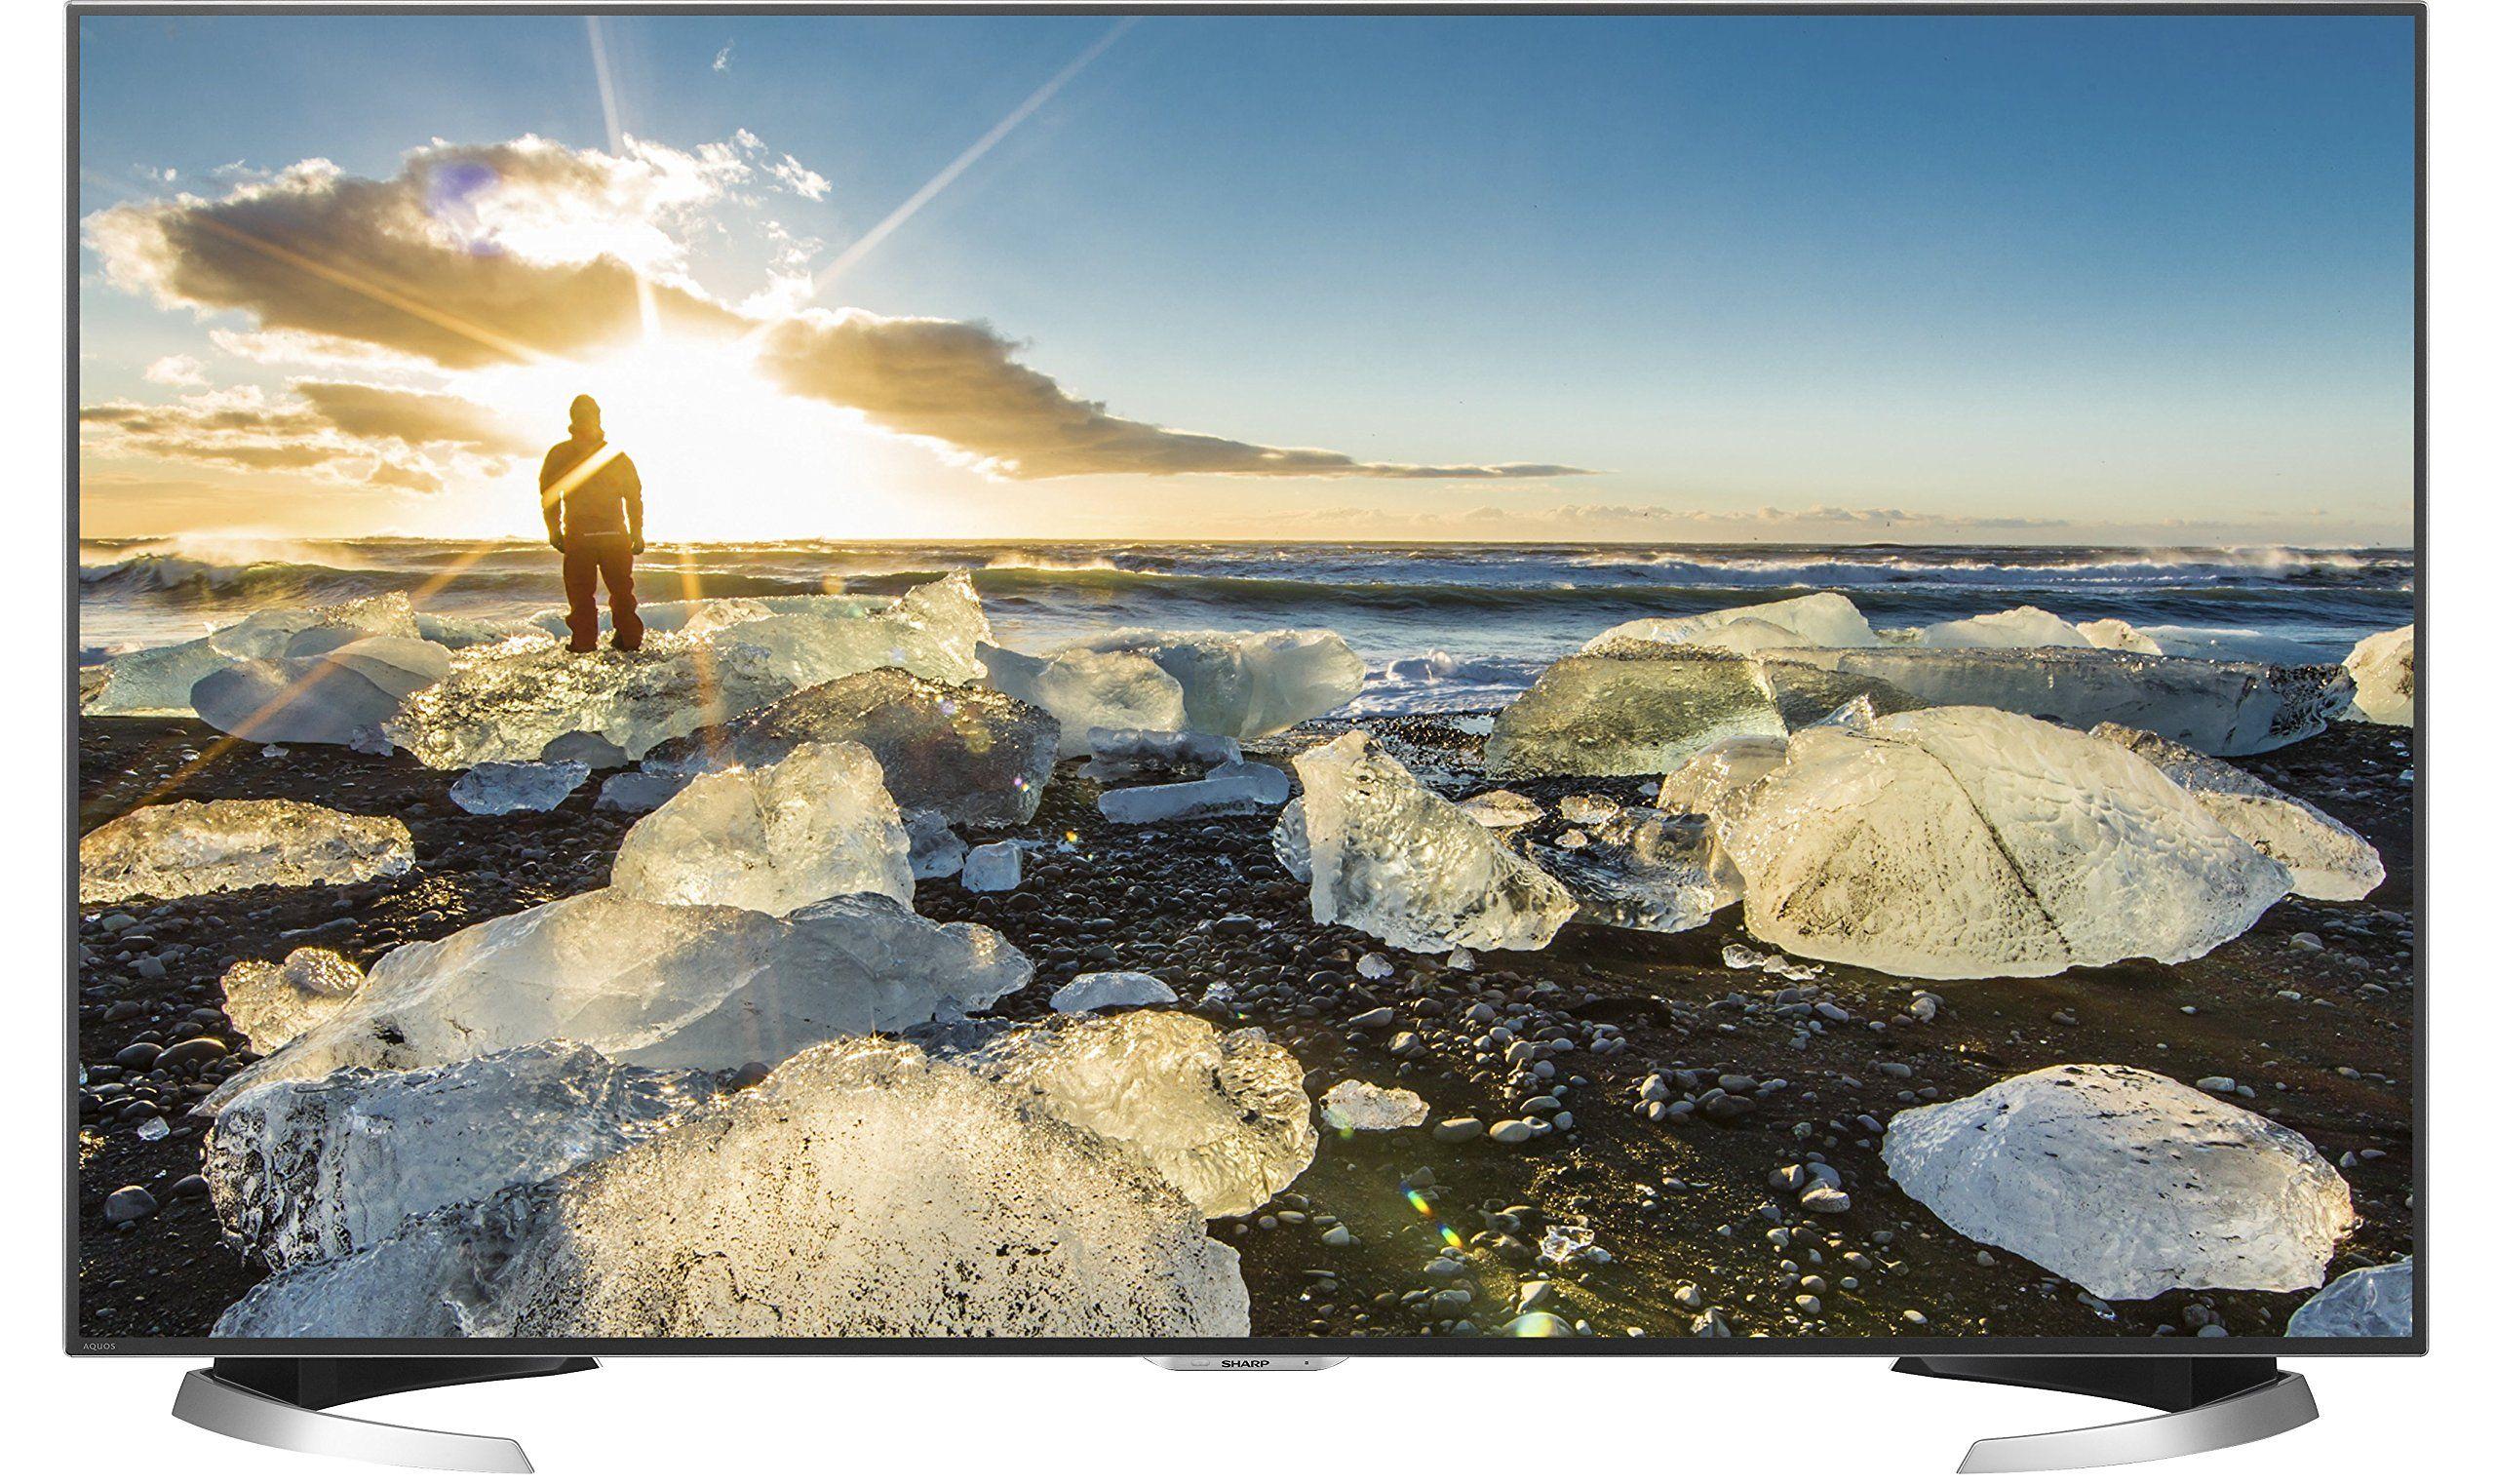 Couponreport Org Led Tv 4k Tv Ultra Hd